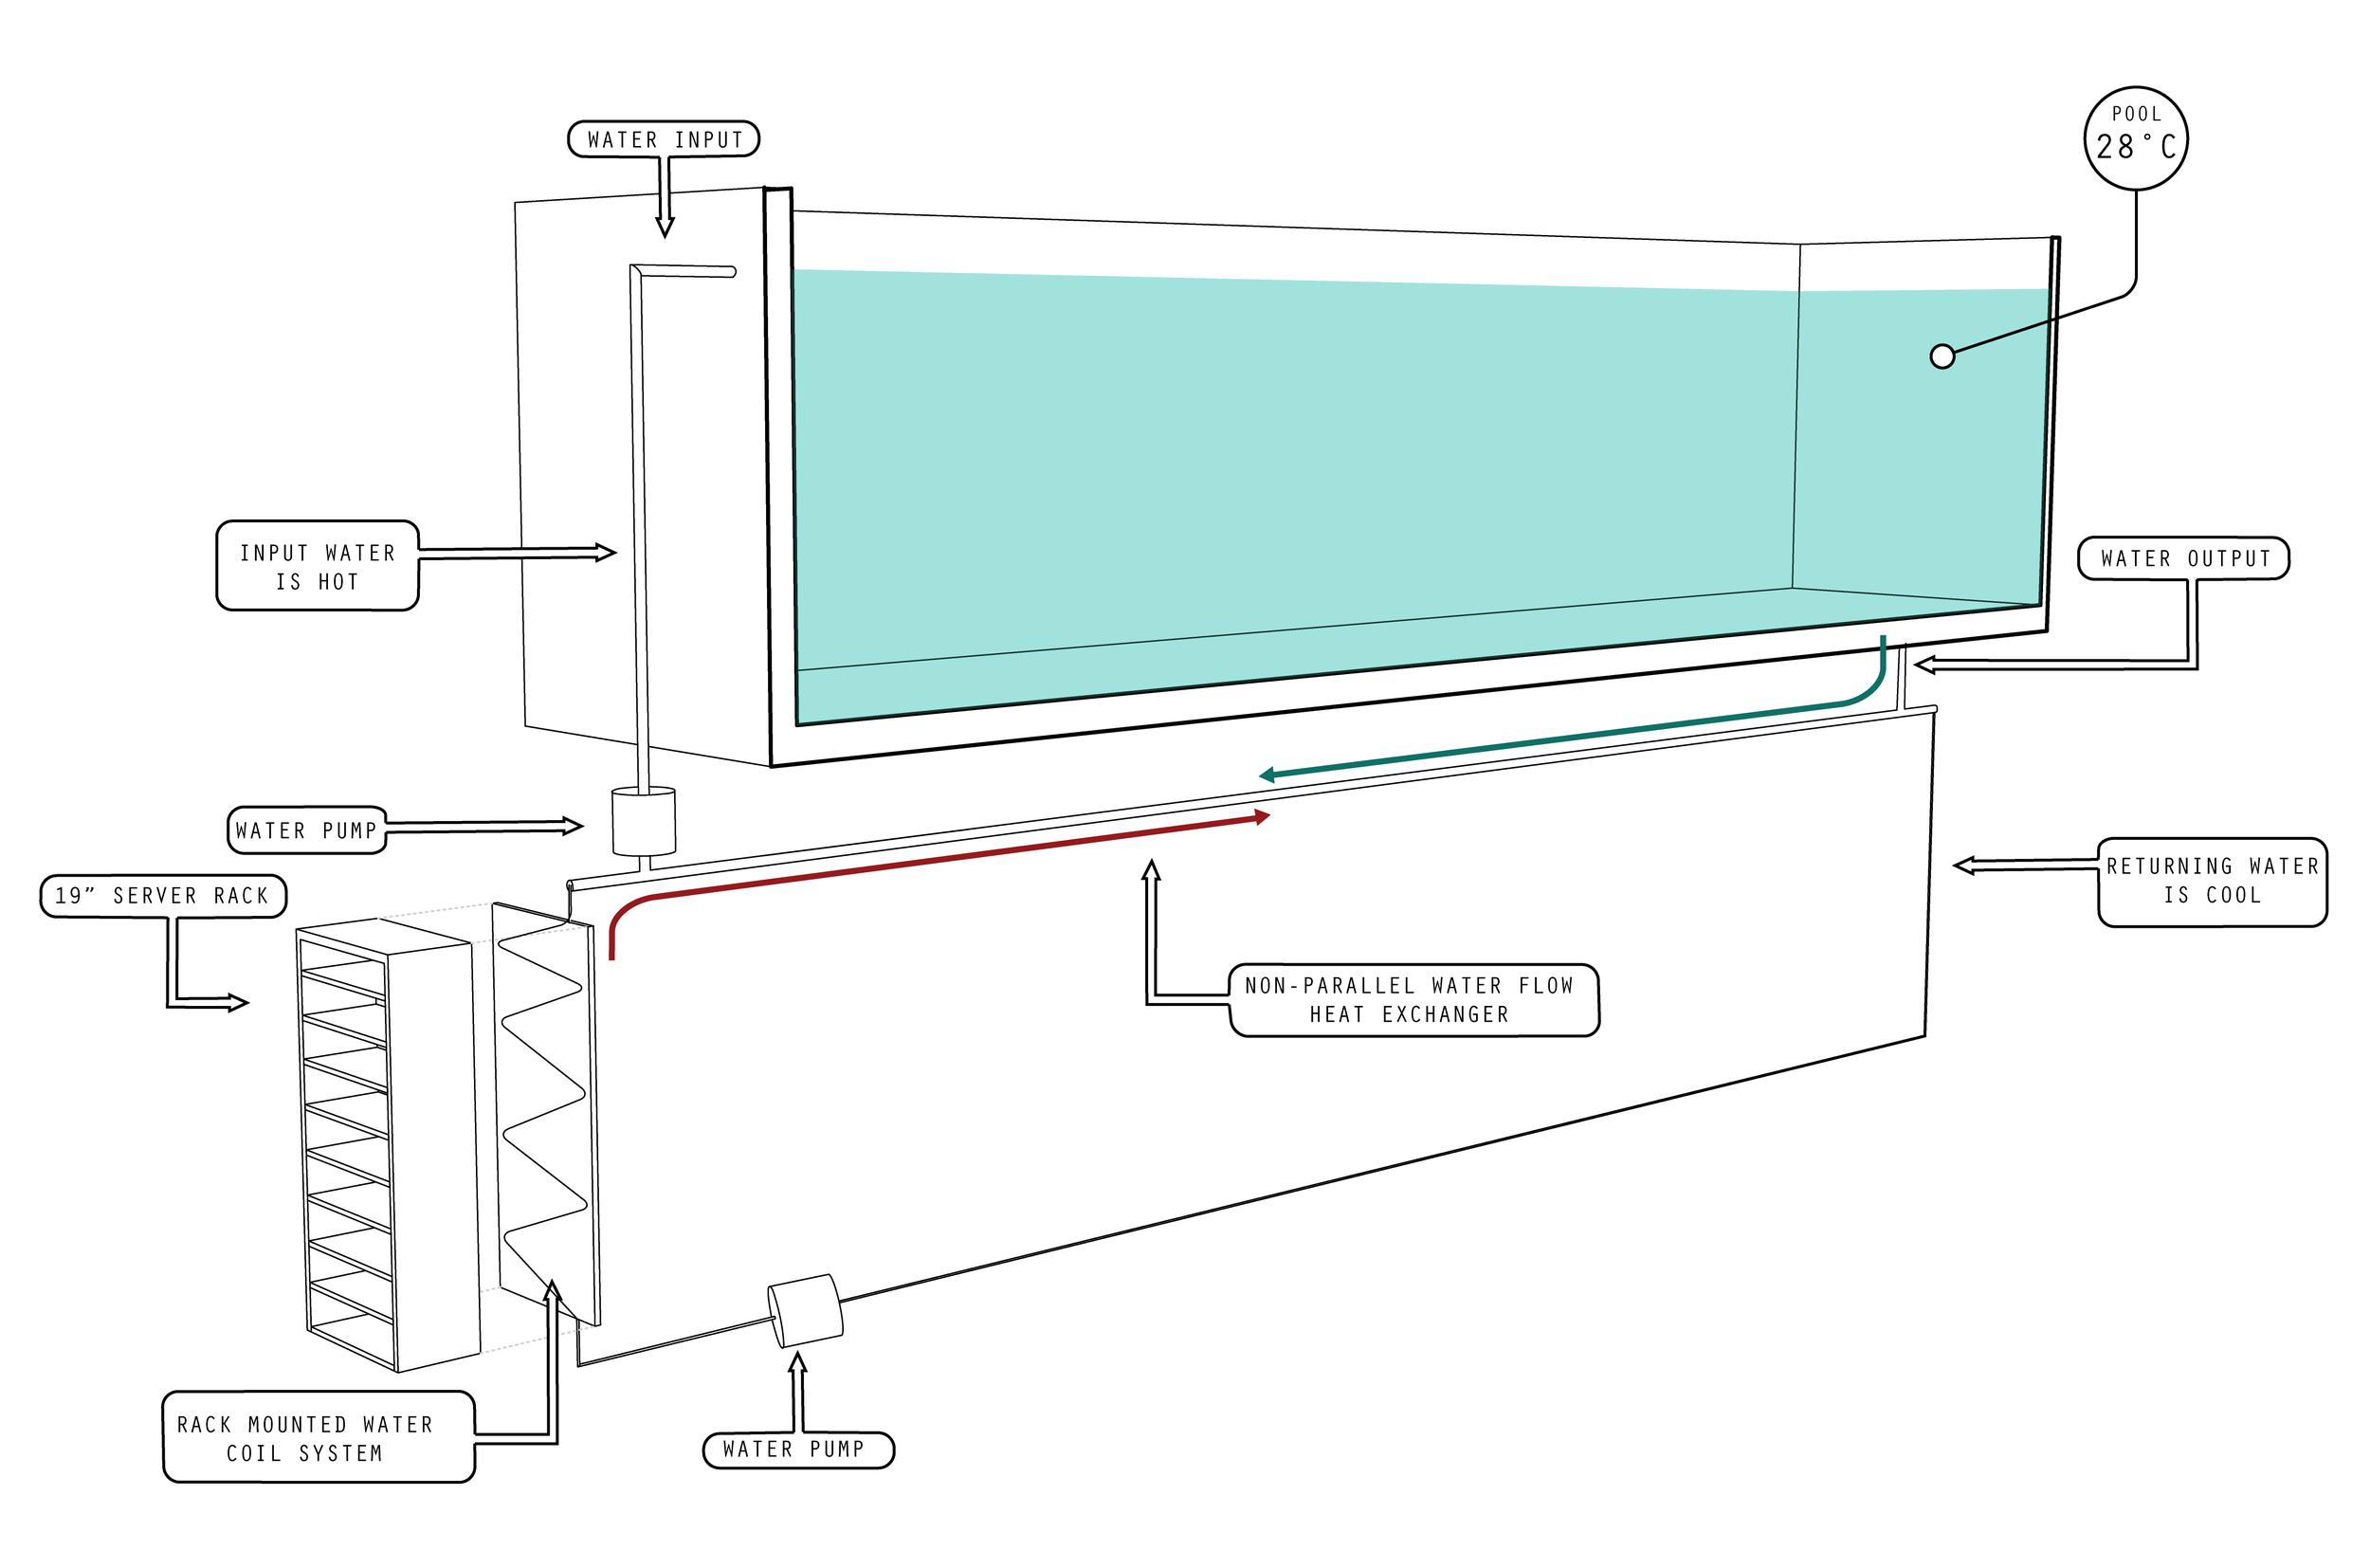 22457105-mechanical_diagram-01.png